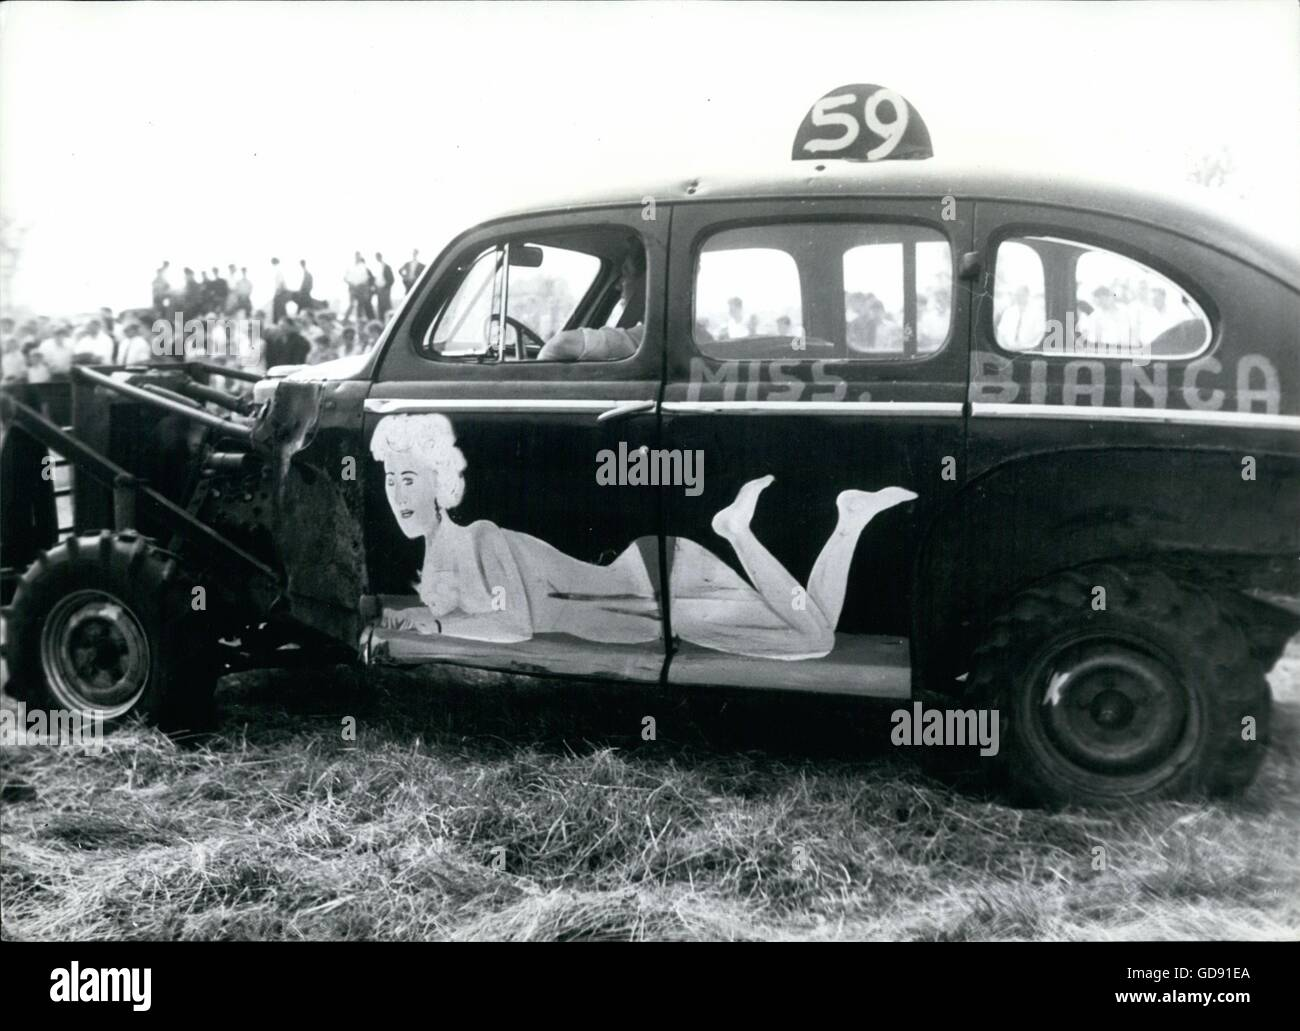 1959 - miss bianca art on car tax derby crash © Keystone Pictures ...